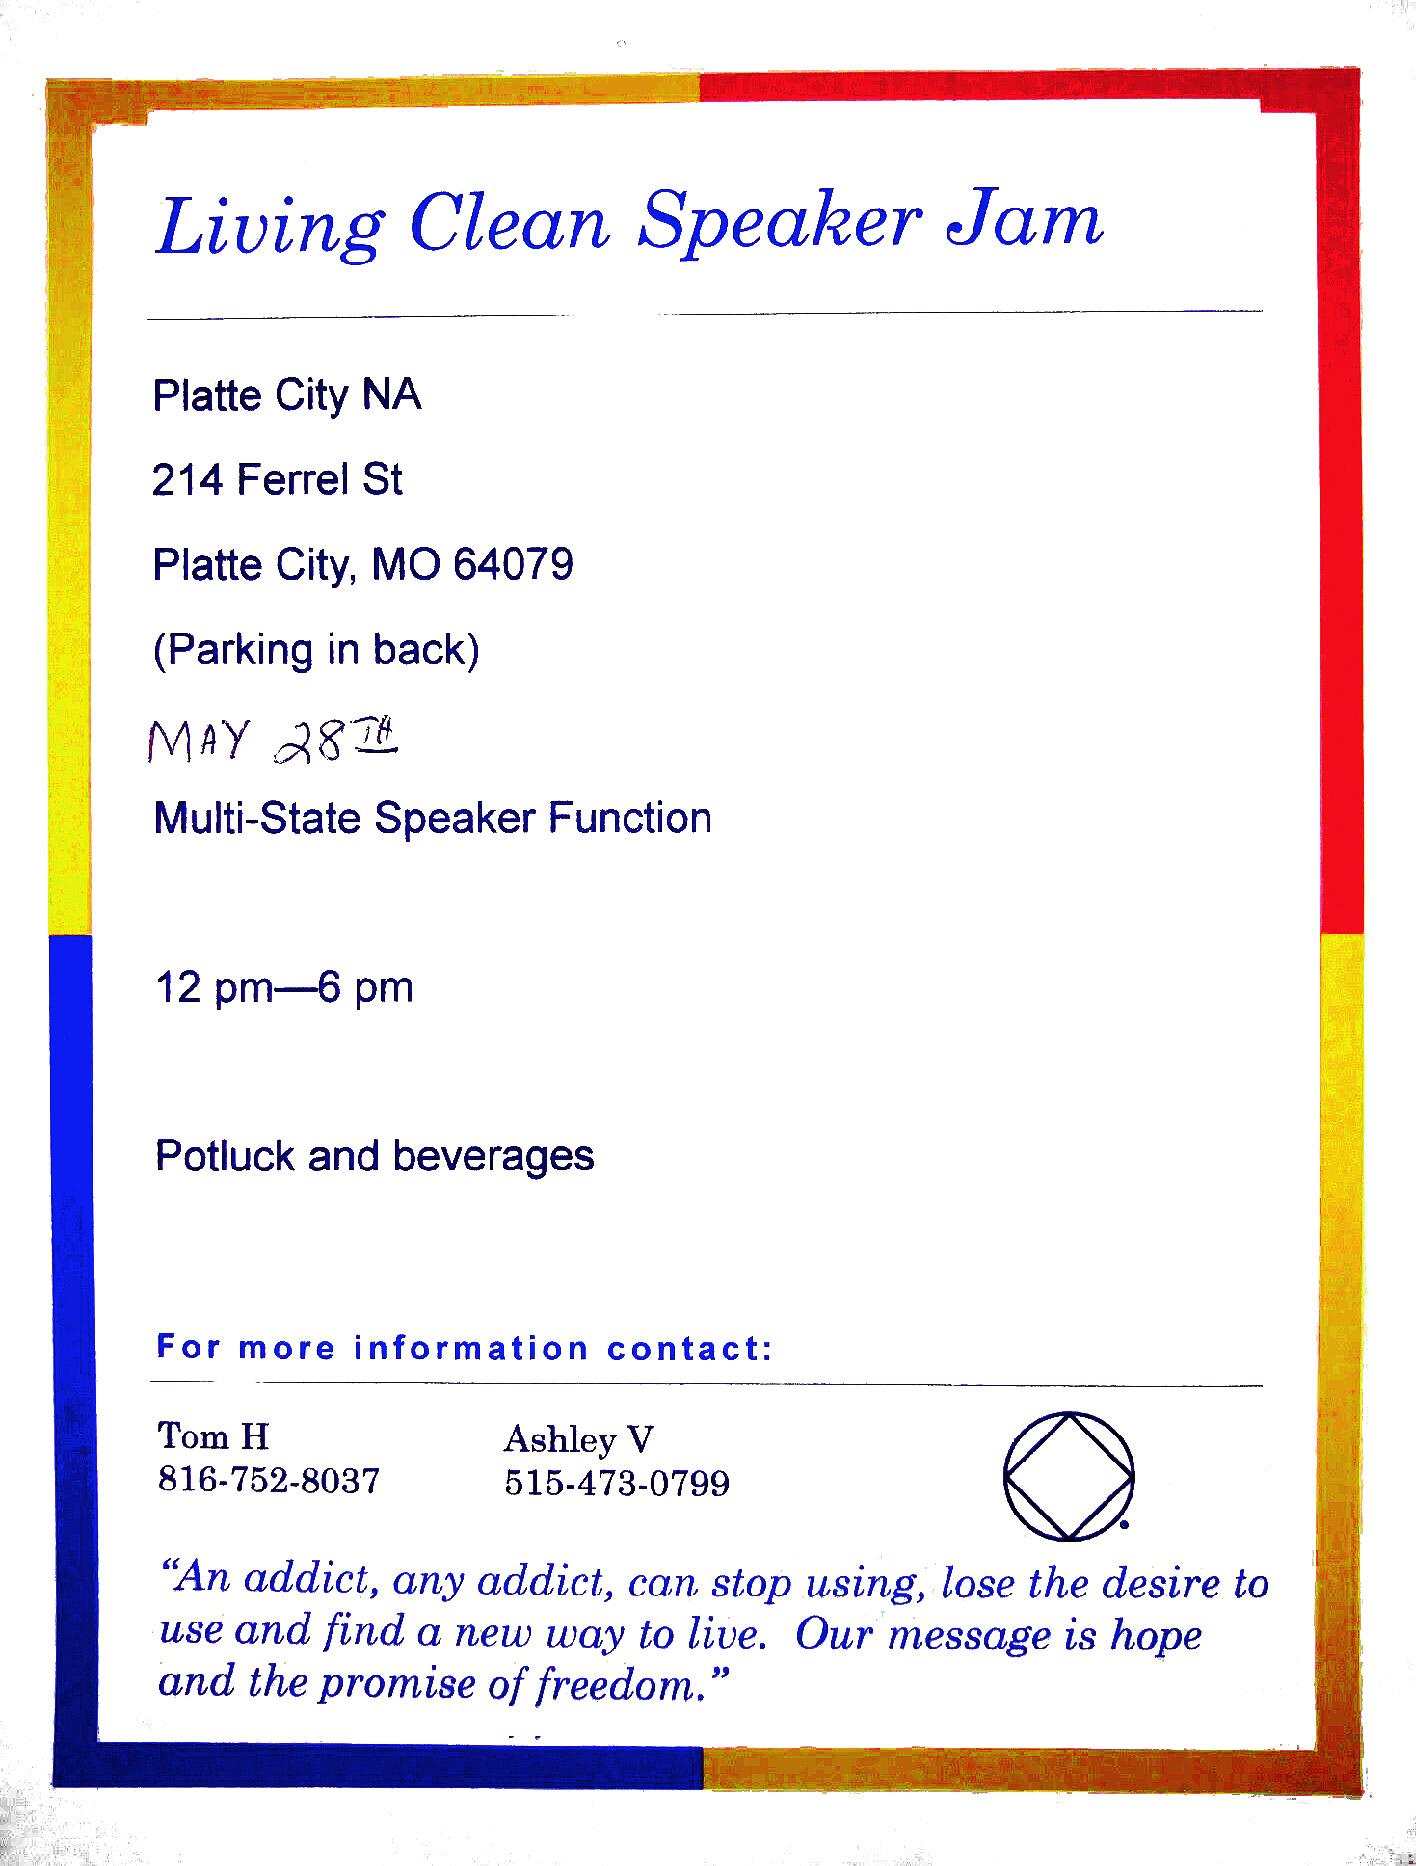 Living Clean Speaker Jam, May 28th, Platte City NA